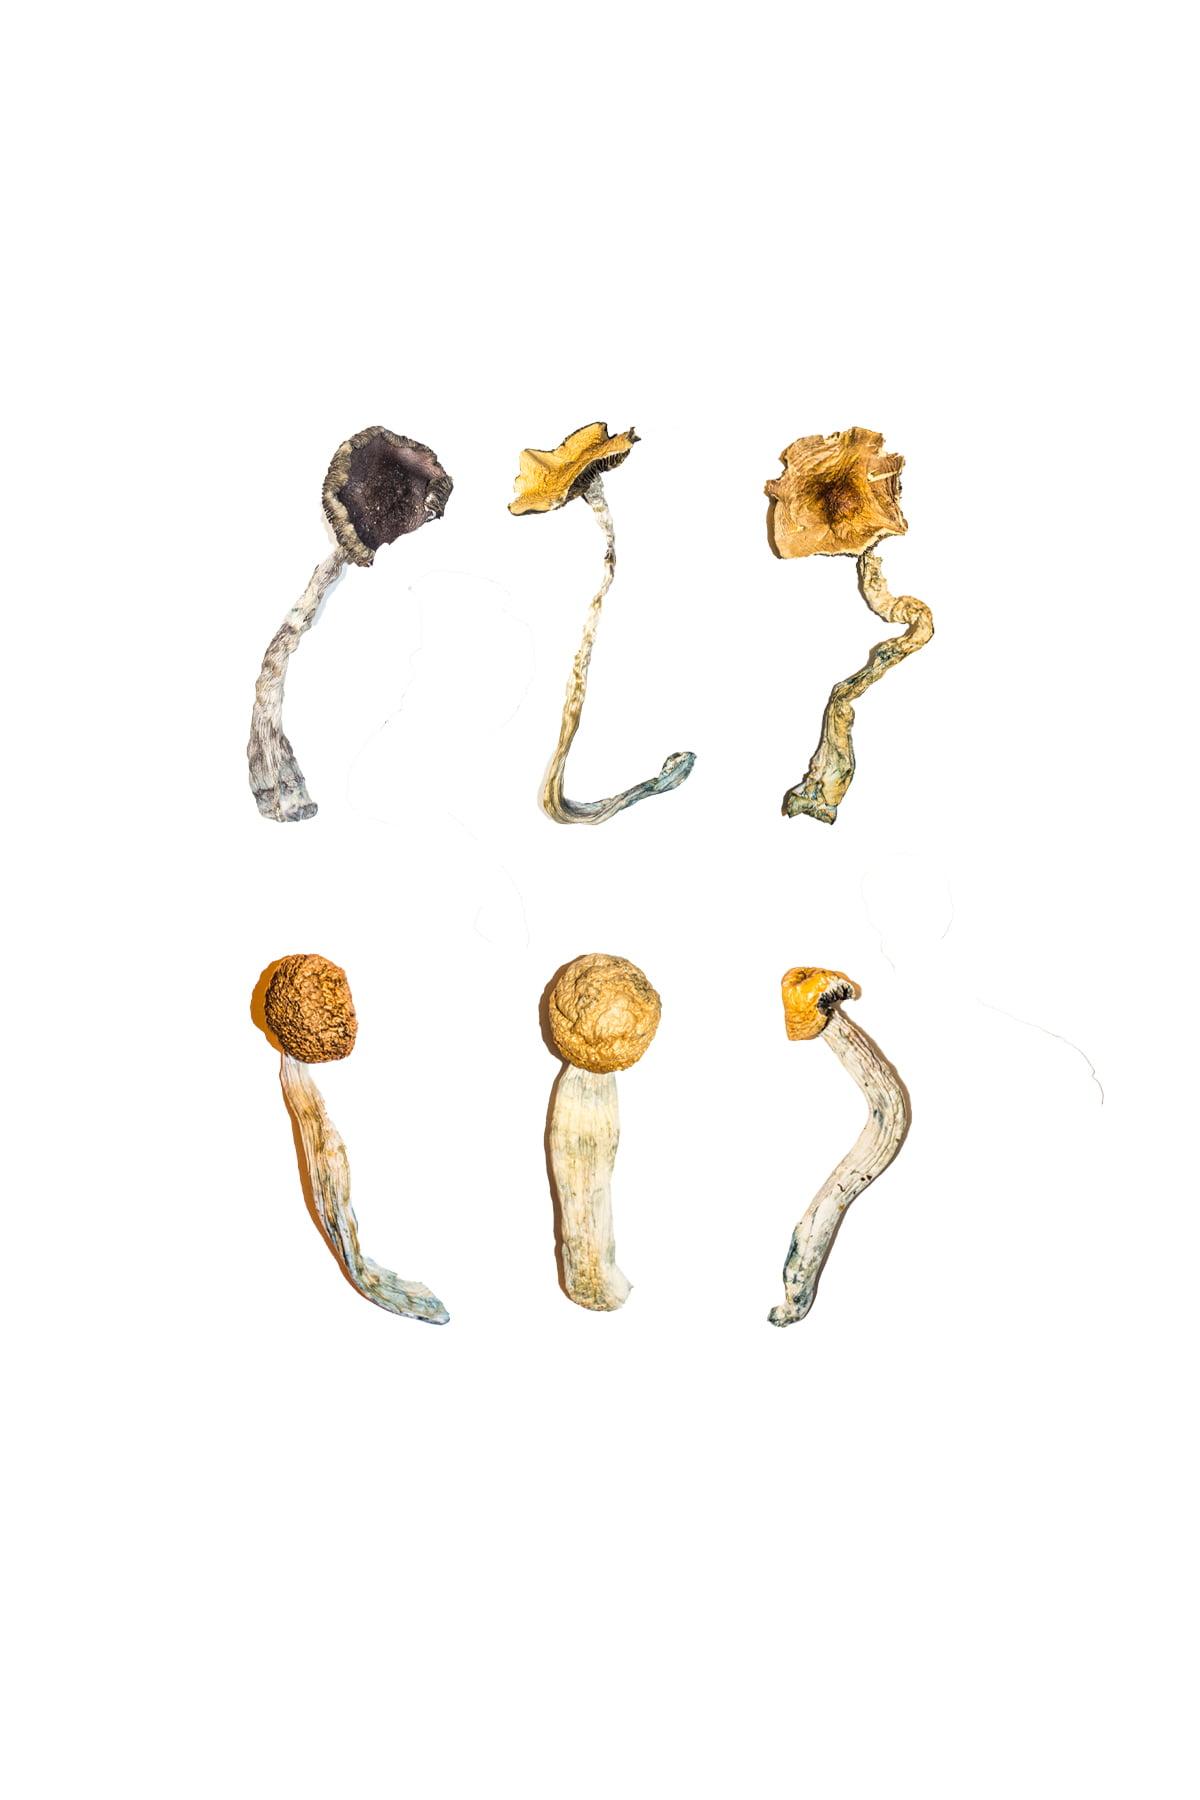 Magic Mushroom Sampler Kit Tasting Menu